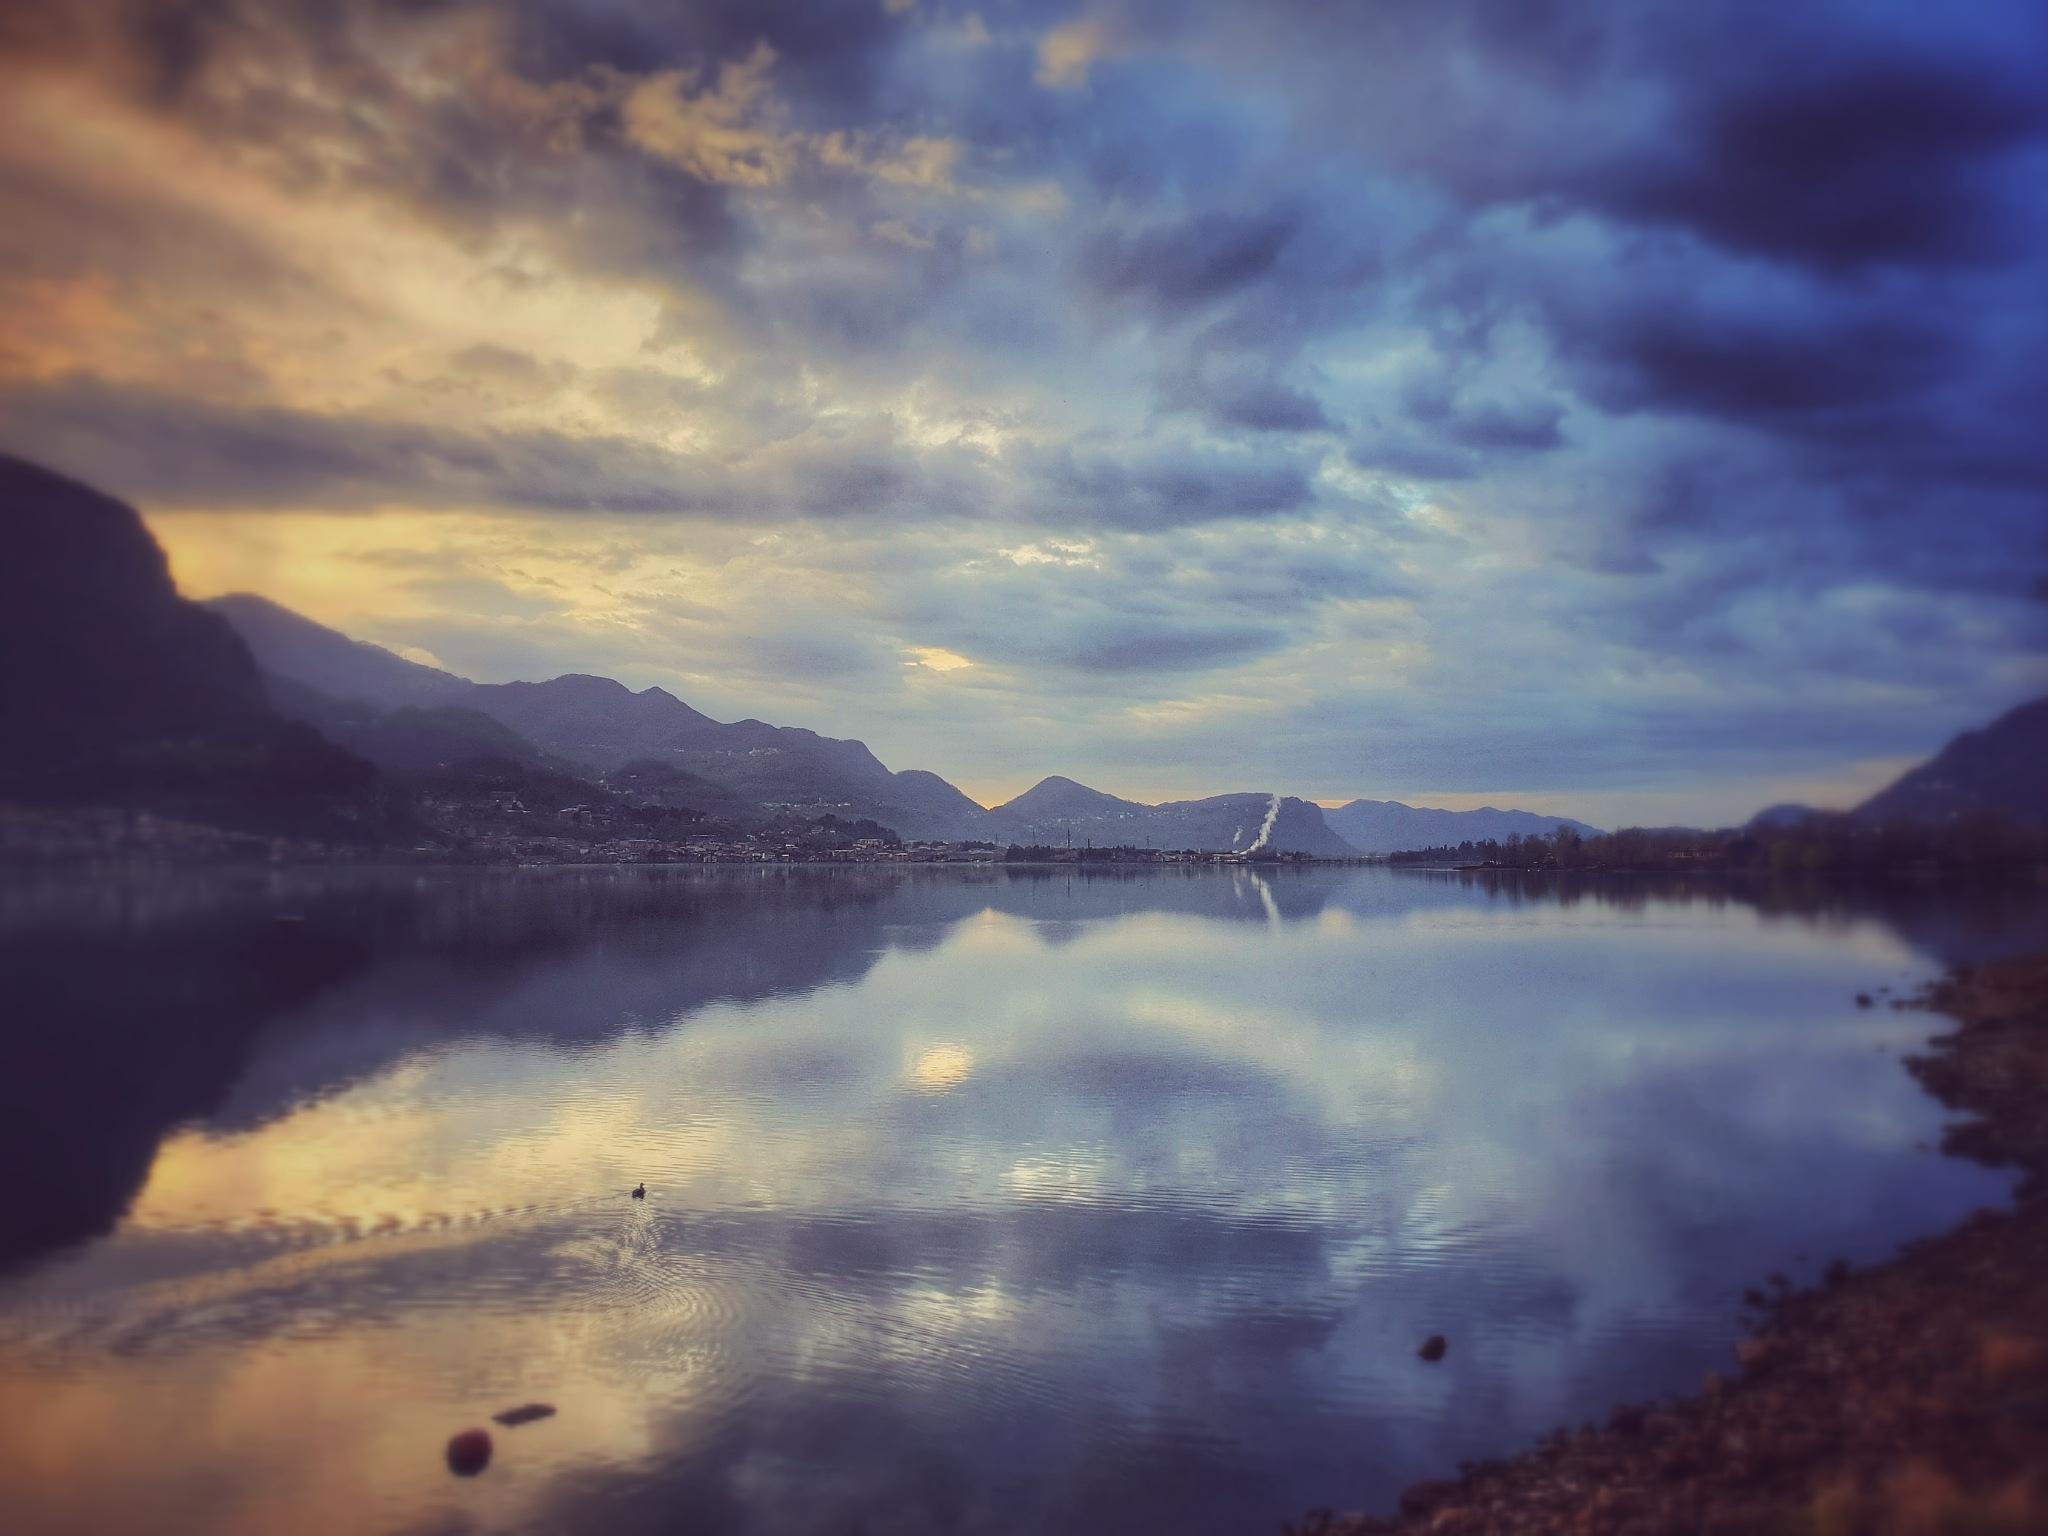 lake Sunrise by Luca Riva